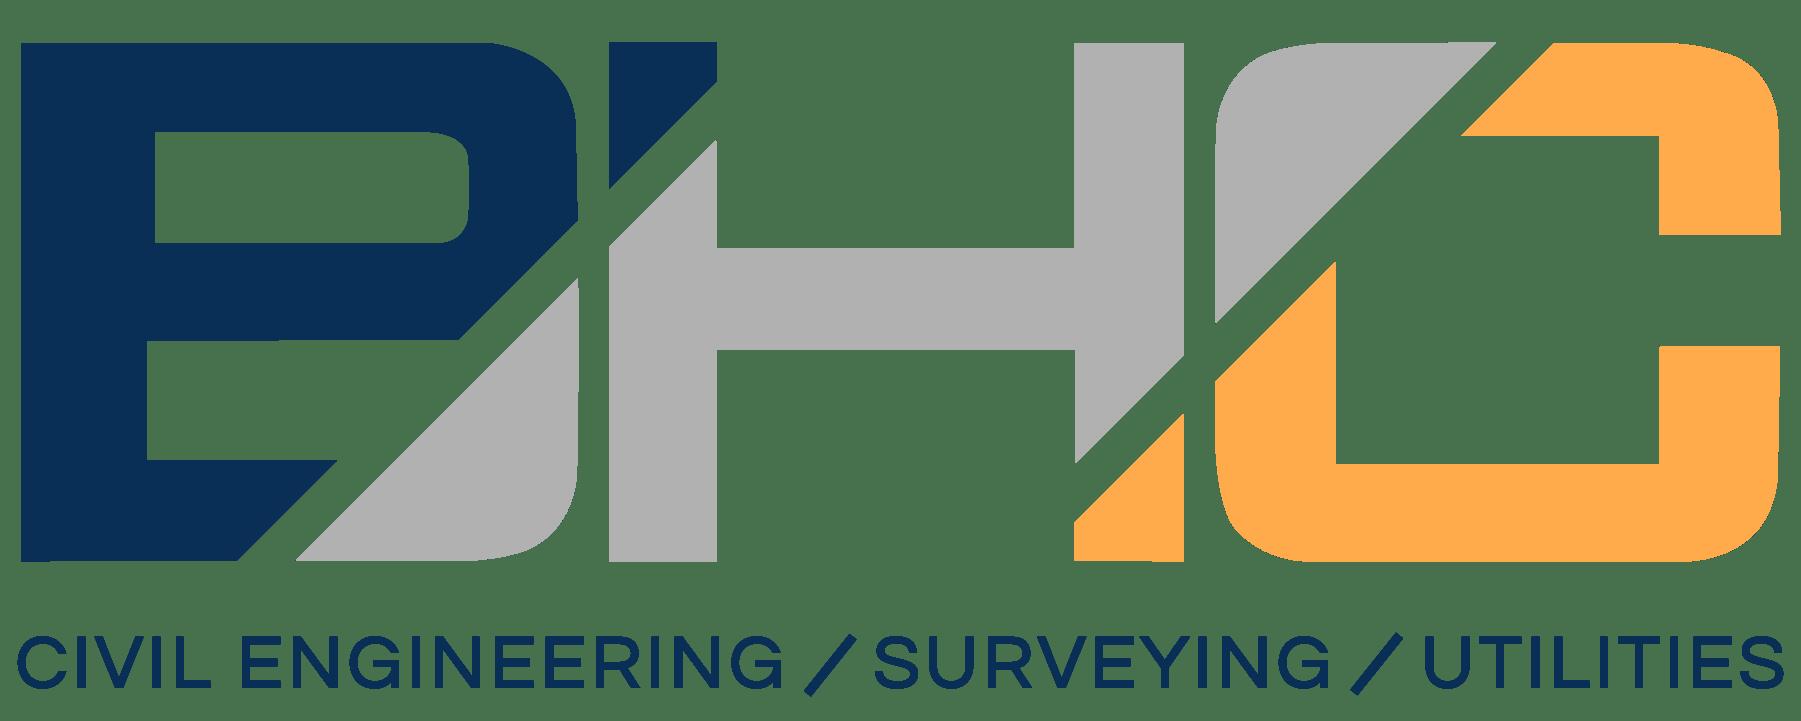 BHC-Logo_Three-Color-Full